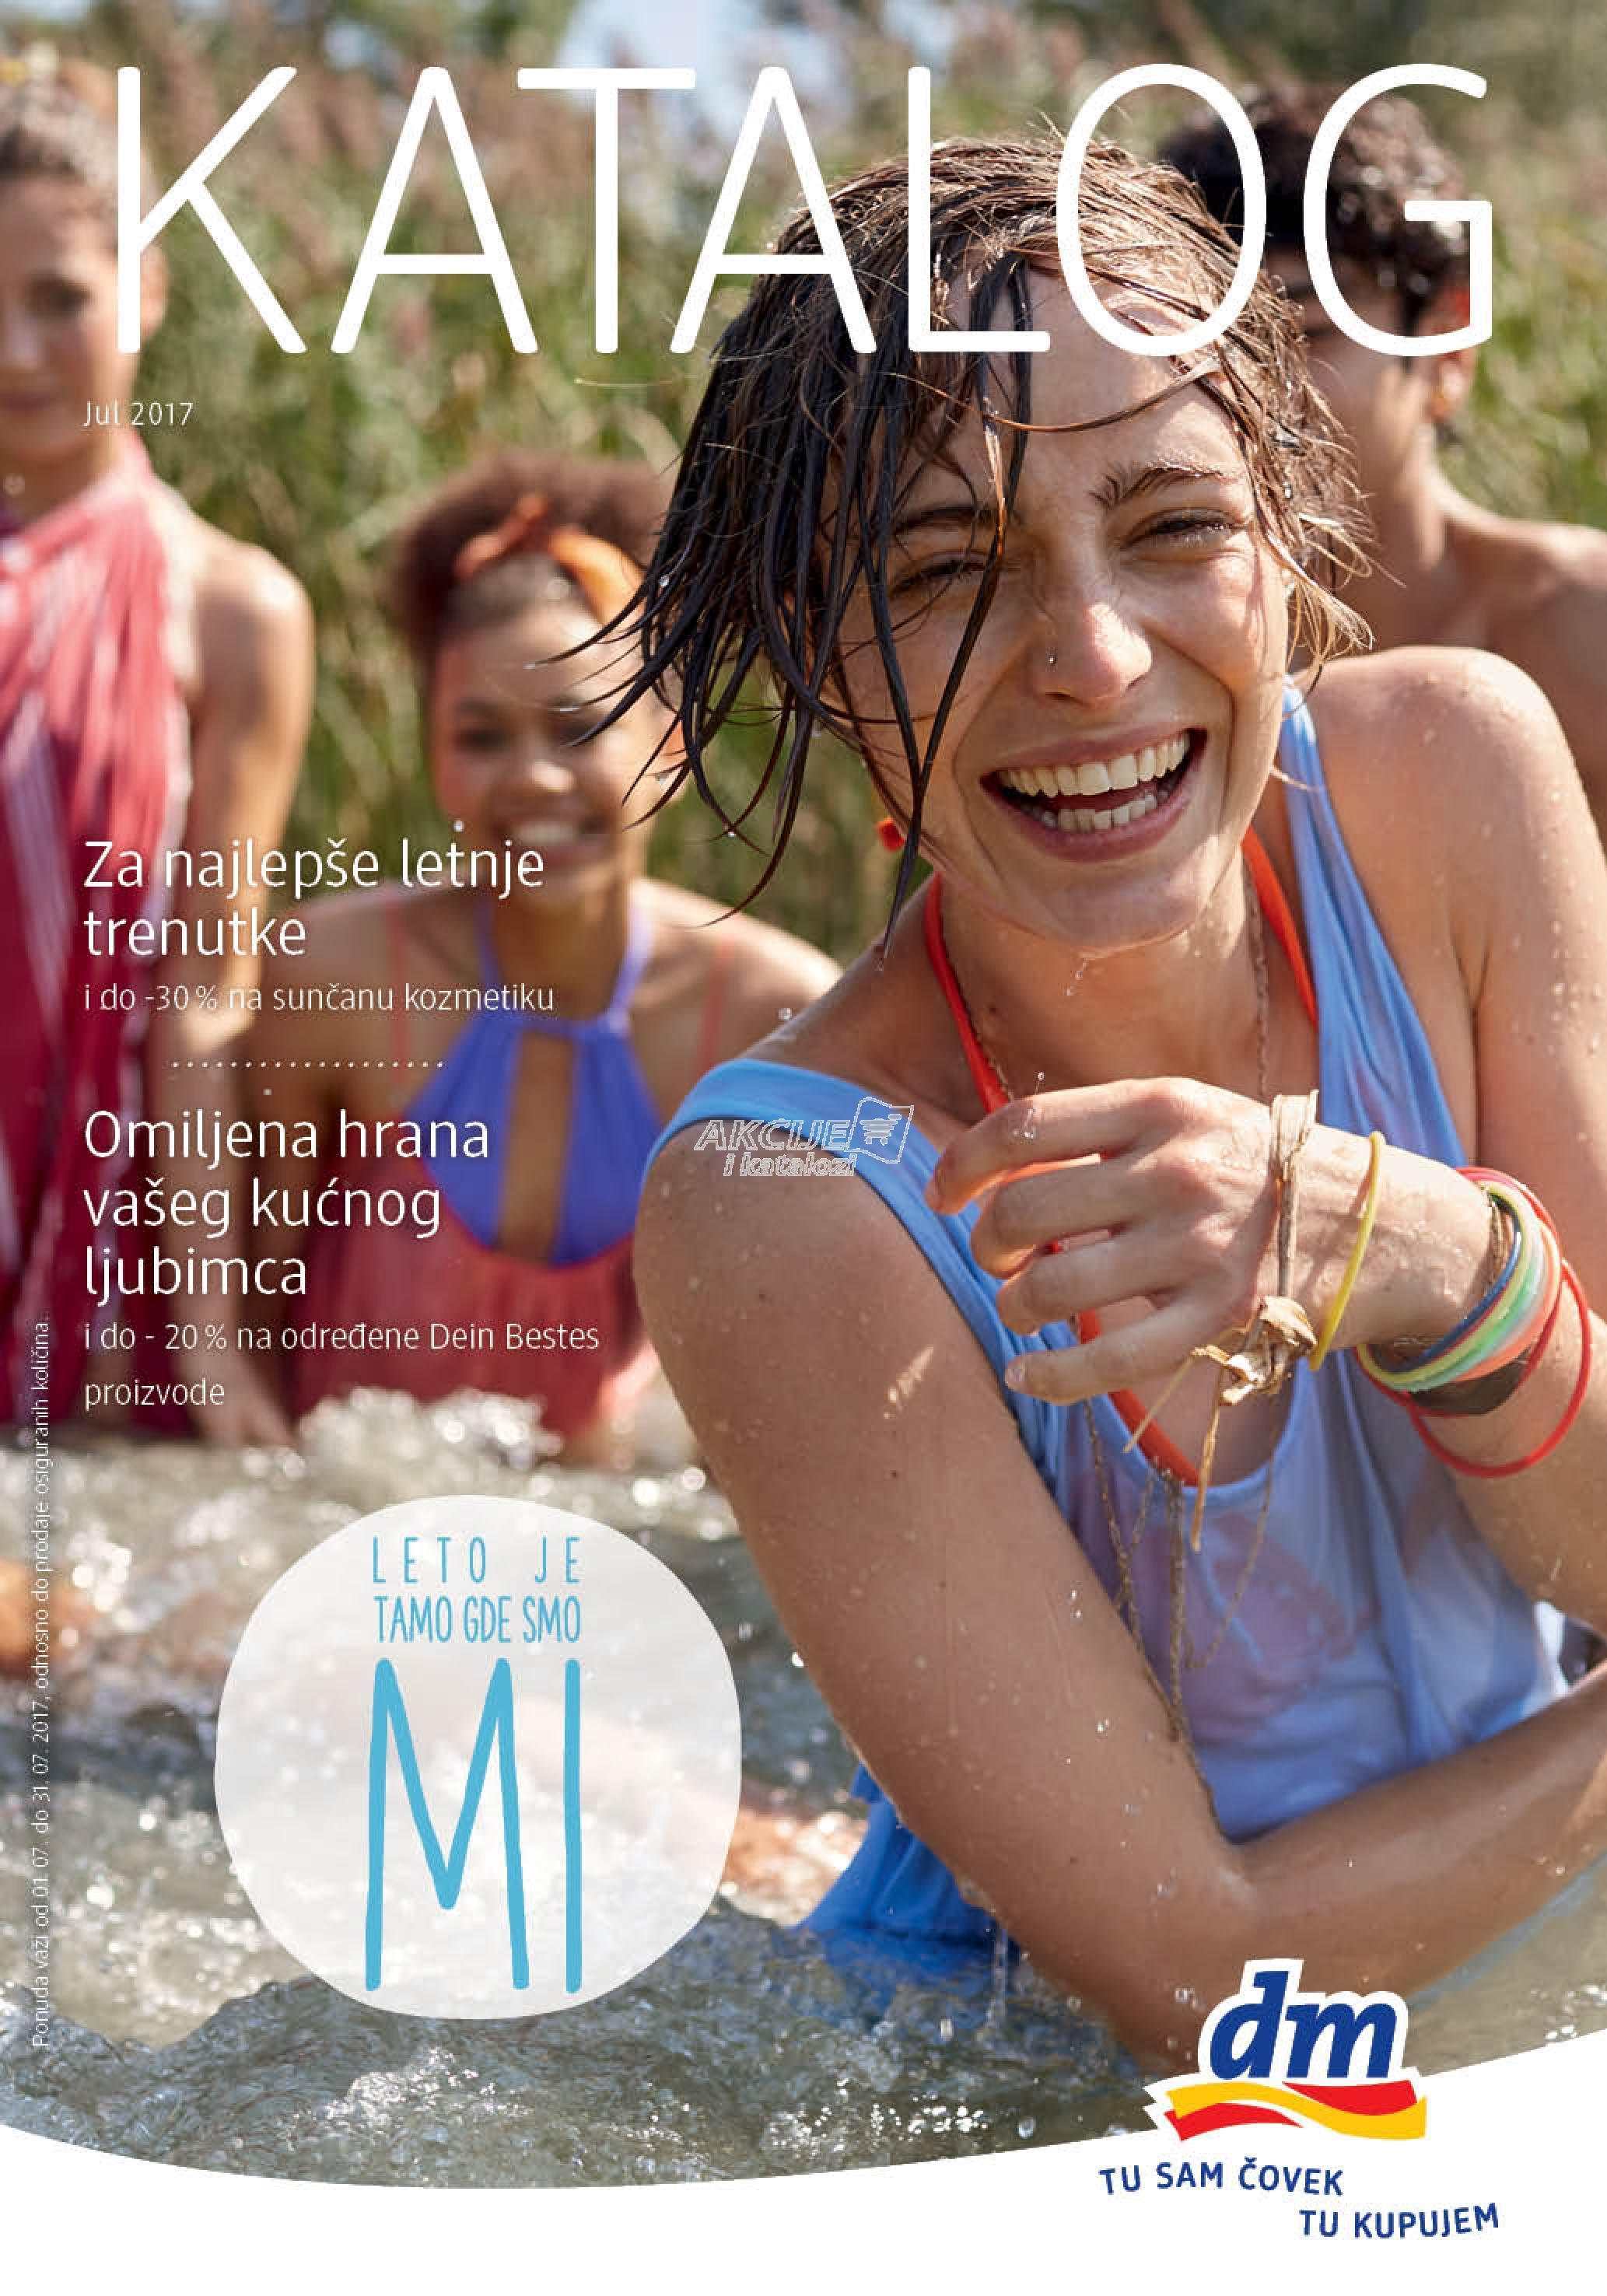 DM - Redovna akcija letnje kupovine